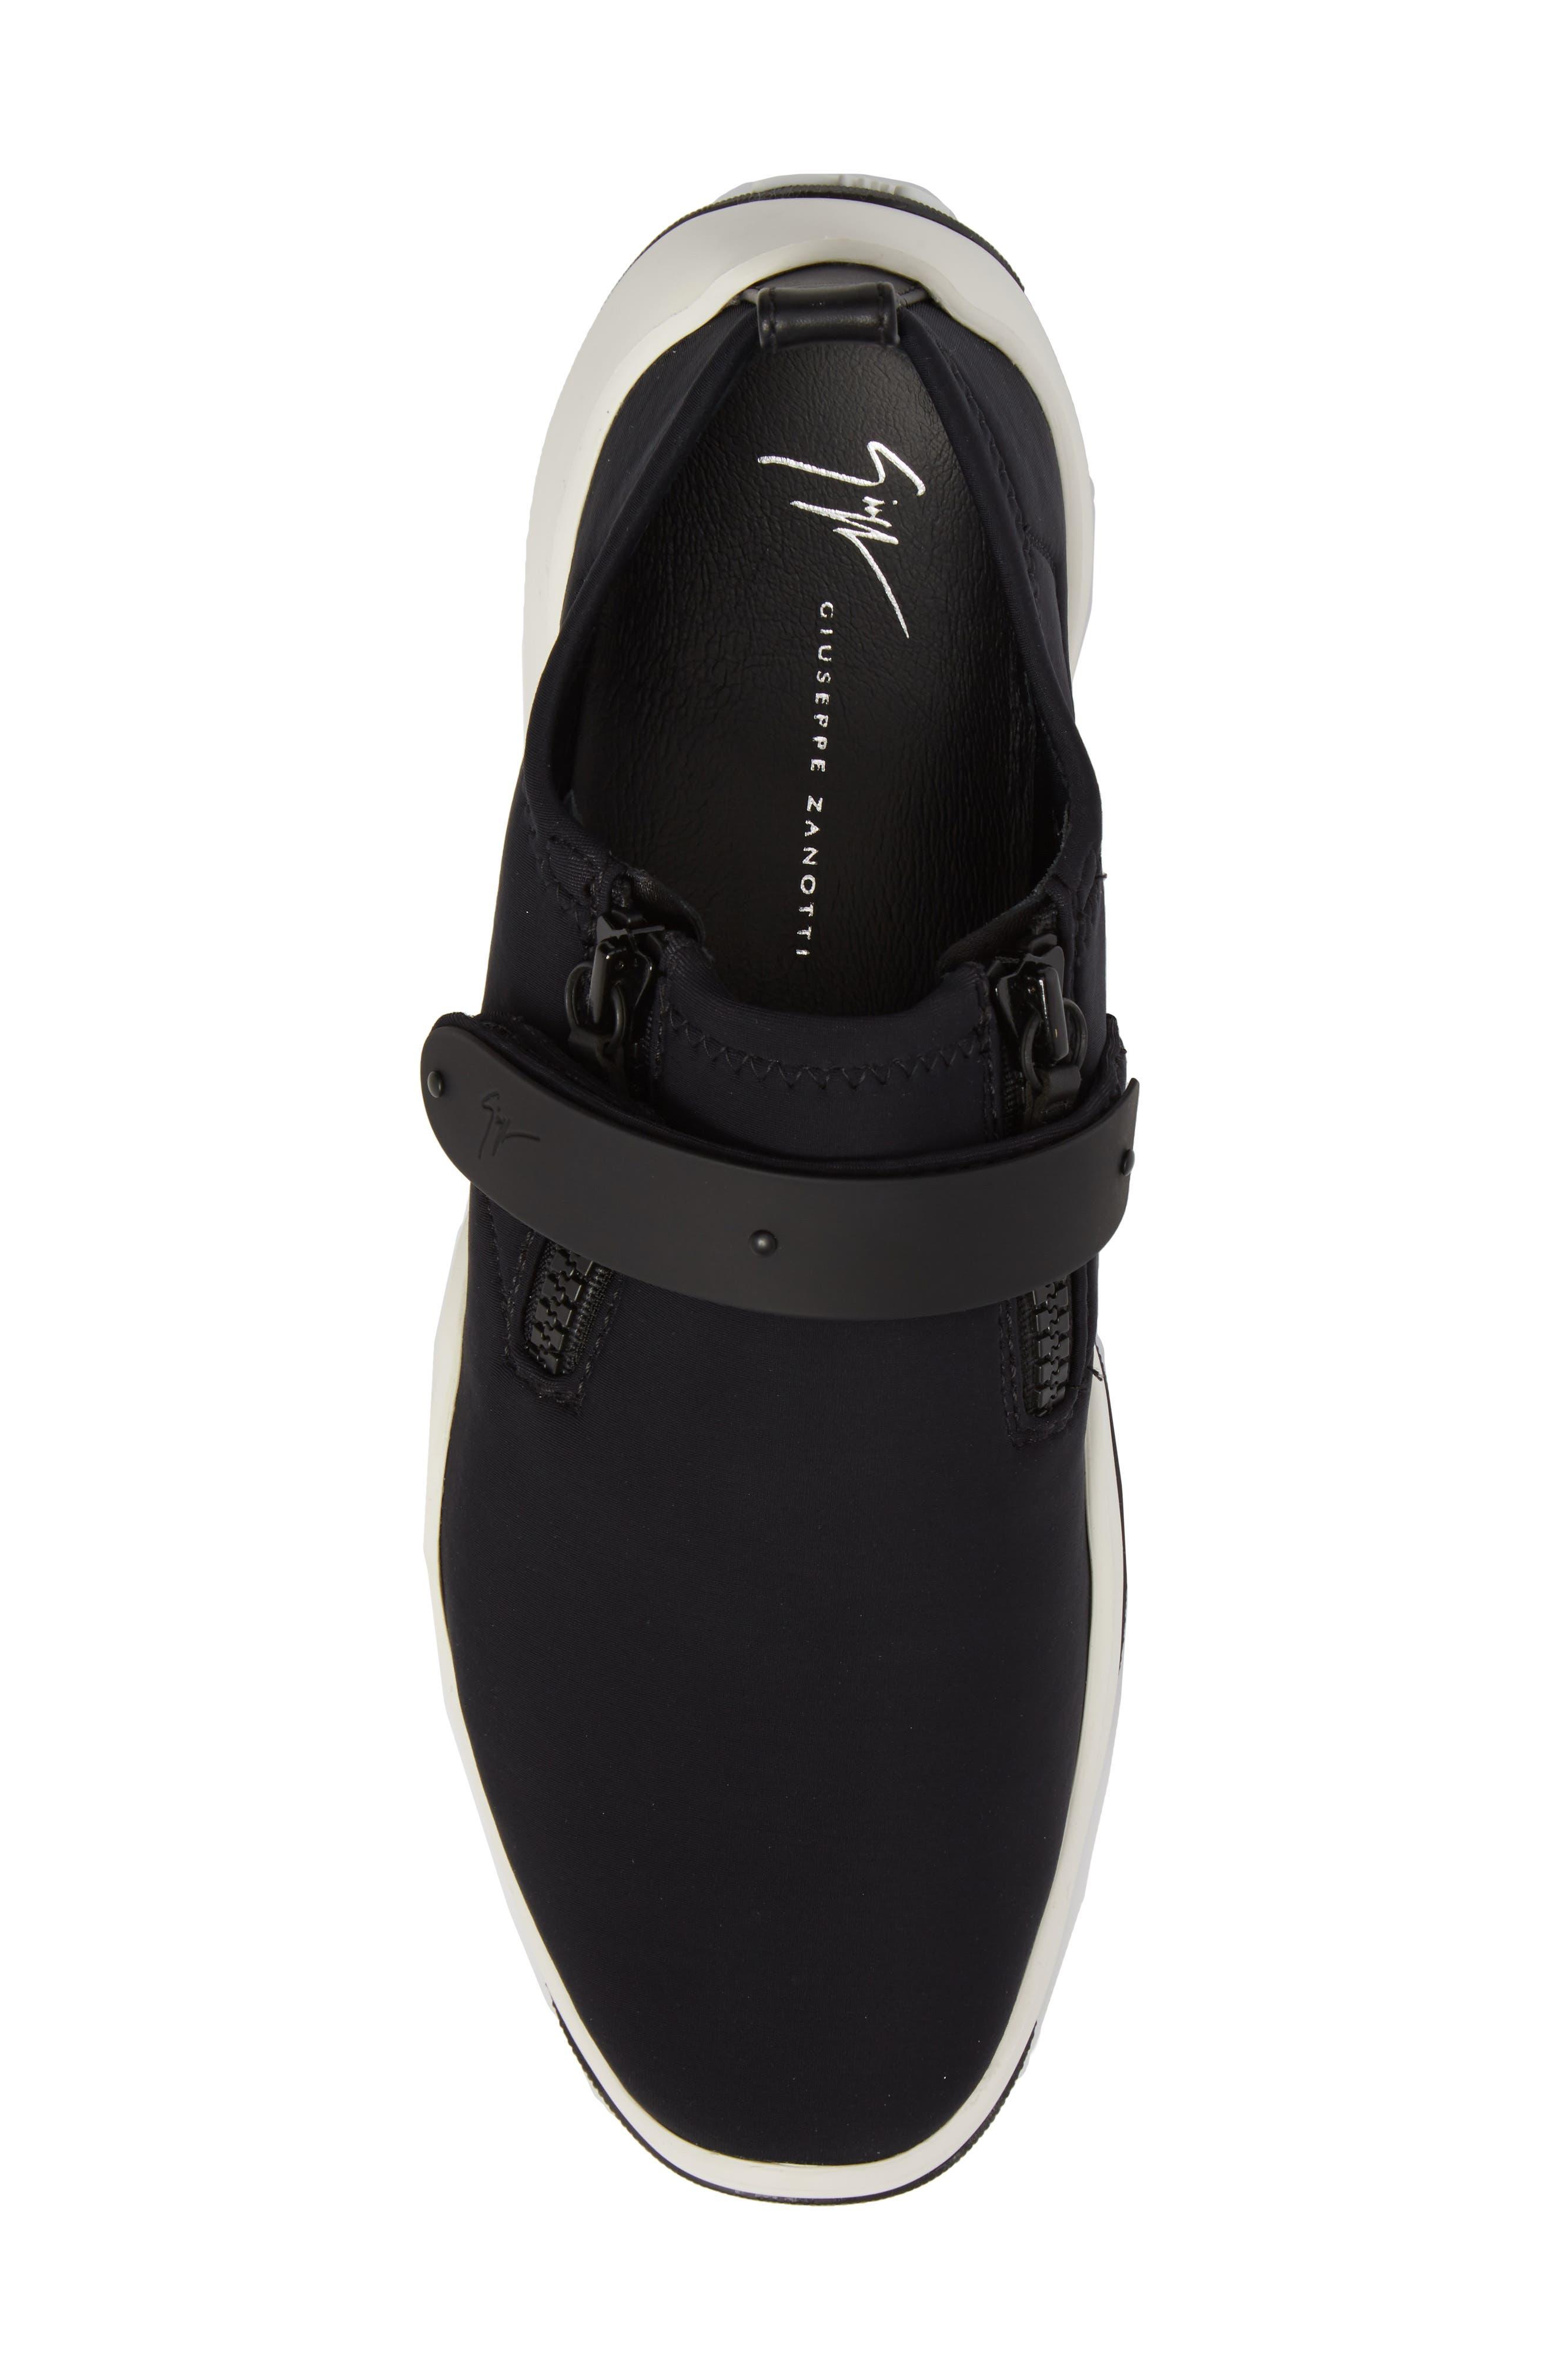 Scuba Strap Sneaker,                             Alternate thumbnail 5, color,                             001